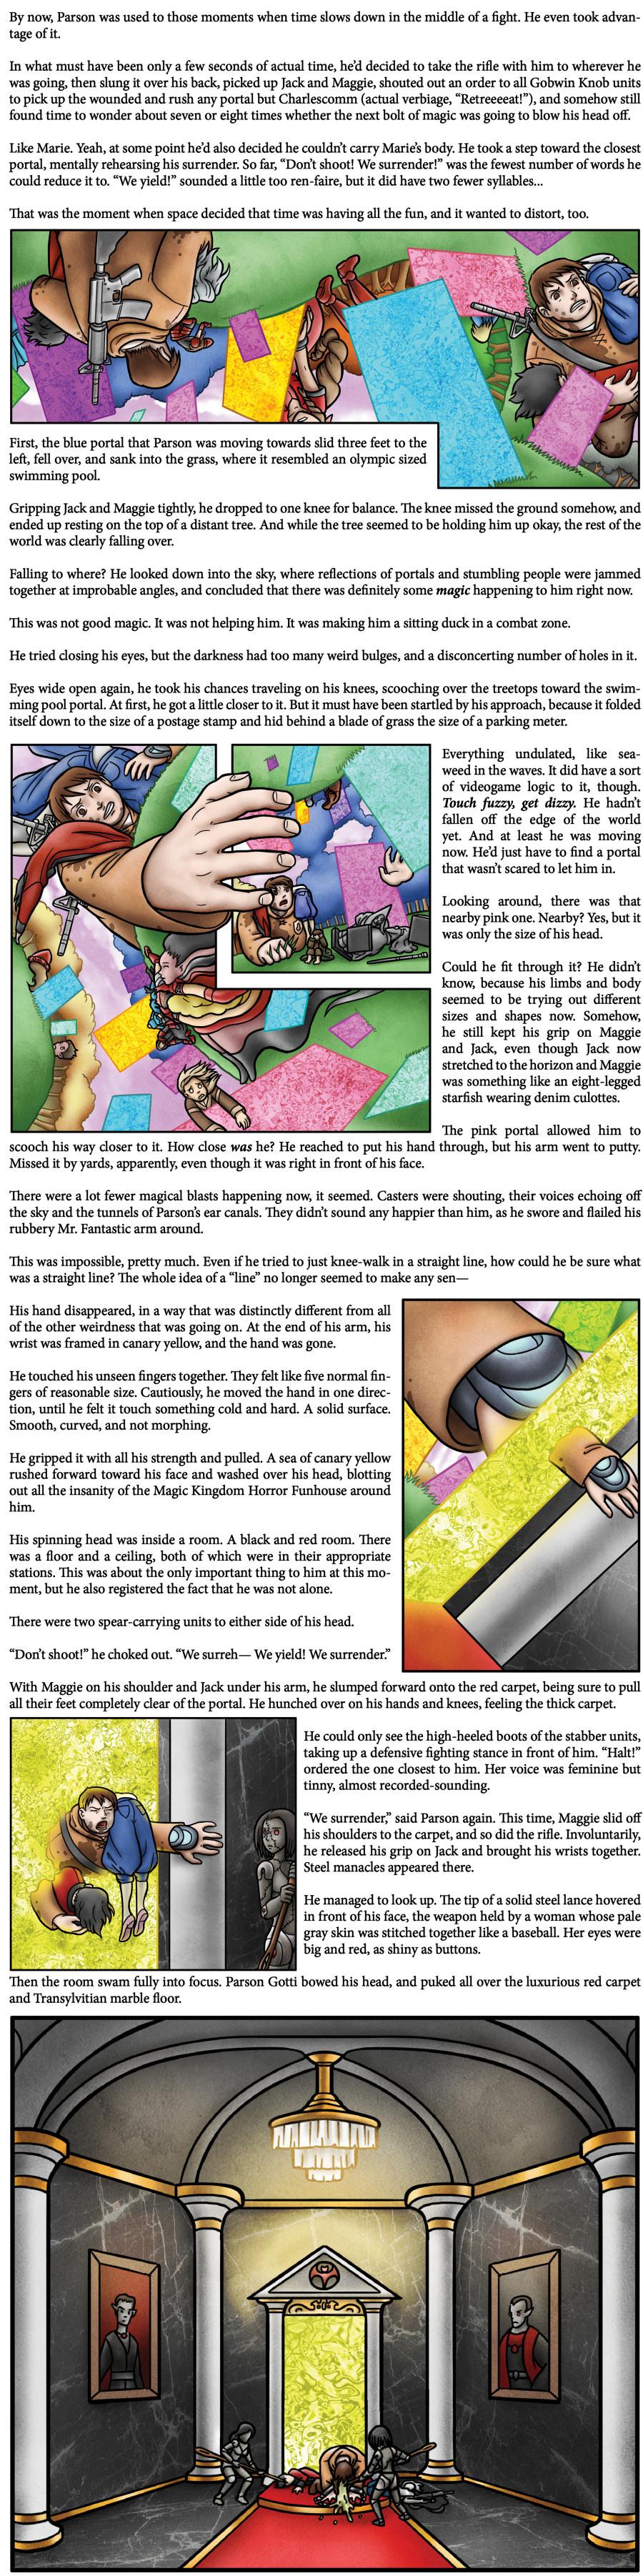 Comic - Book 3 - Page 140